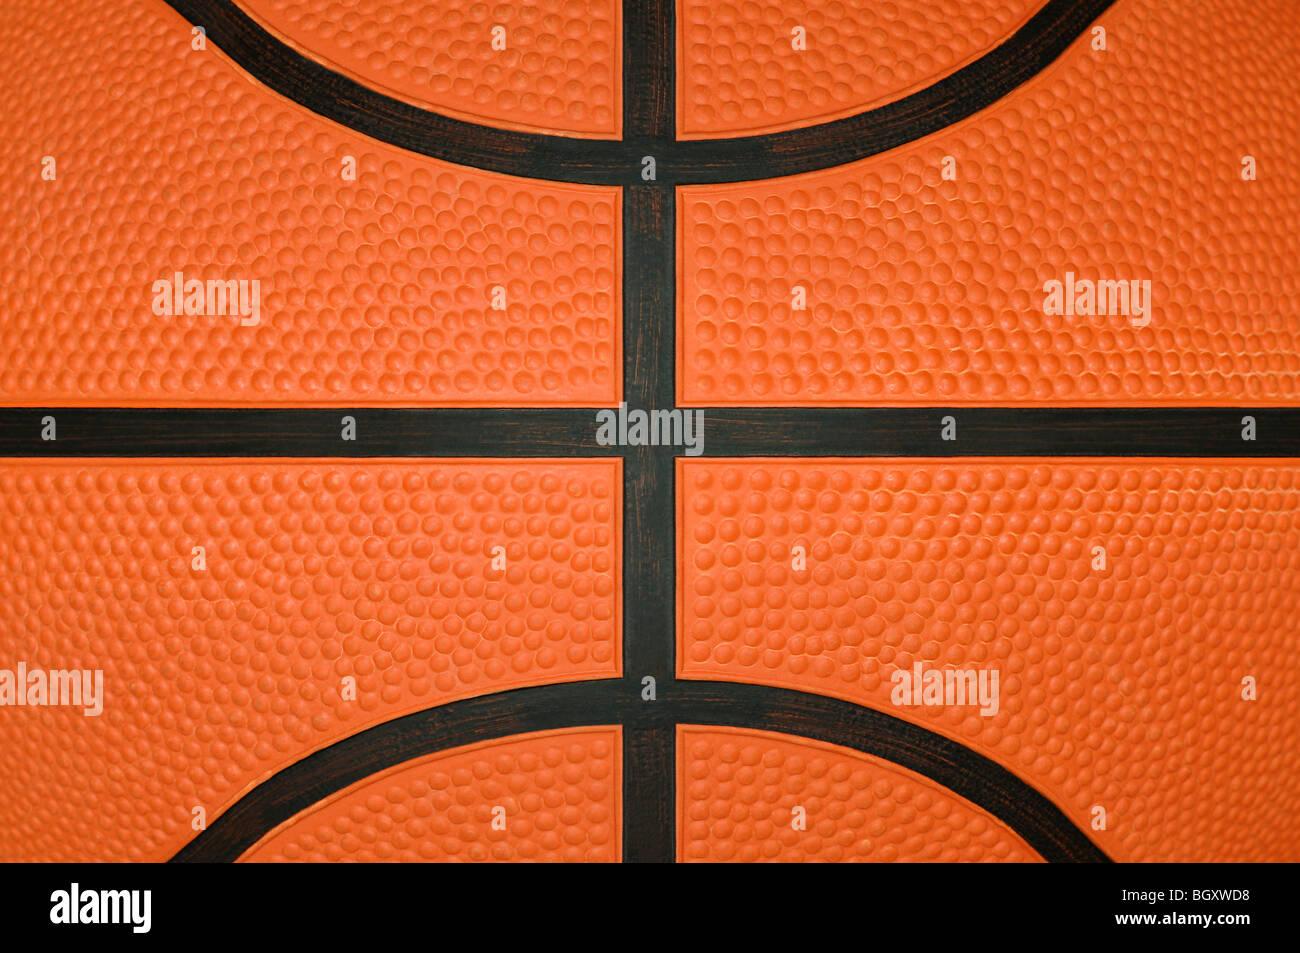 Cerca de baloncesto Foto de stock